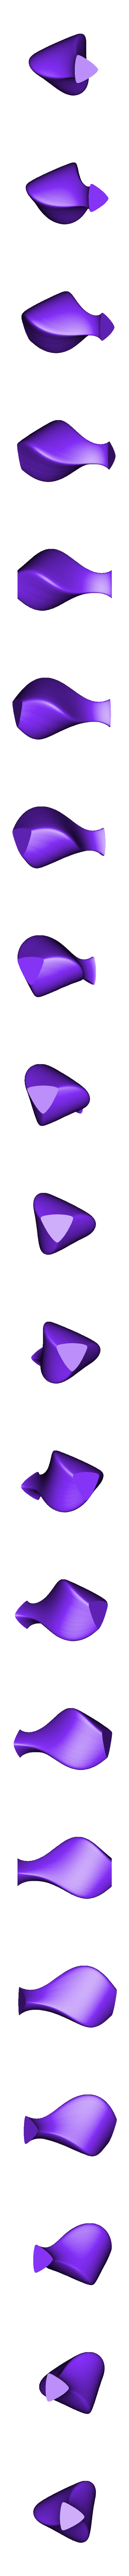 PLActron_vase_delta_V3_100seg_200mmHeight.stl Télécharger fichier STL gratuit PLActron vase delta • Objet pour impression 3D, Palemar